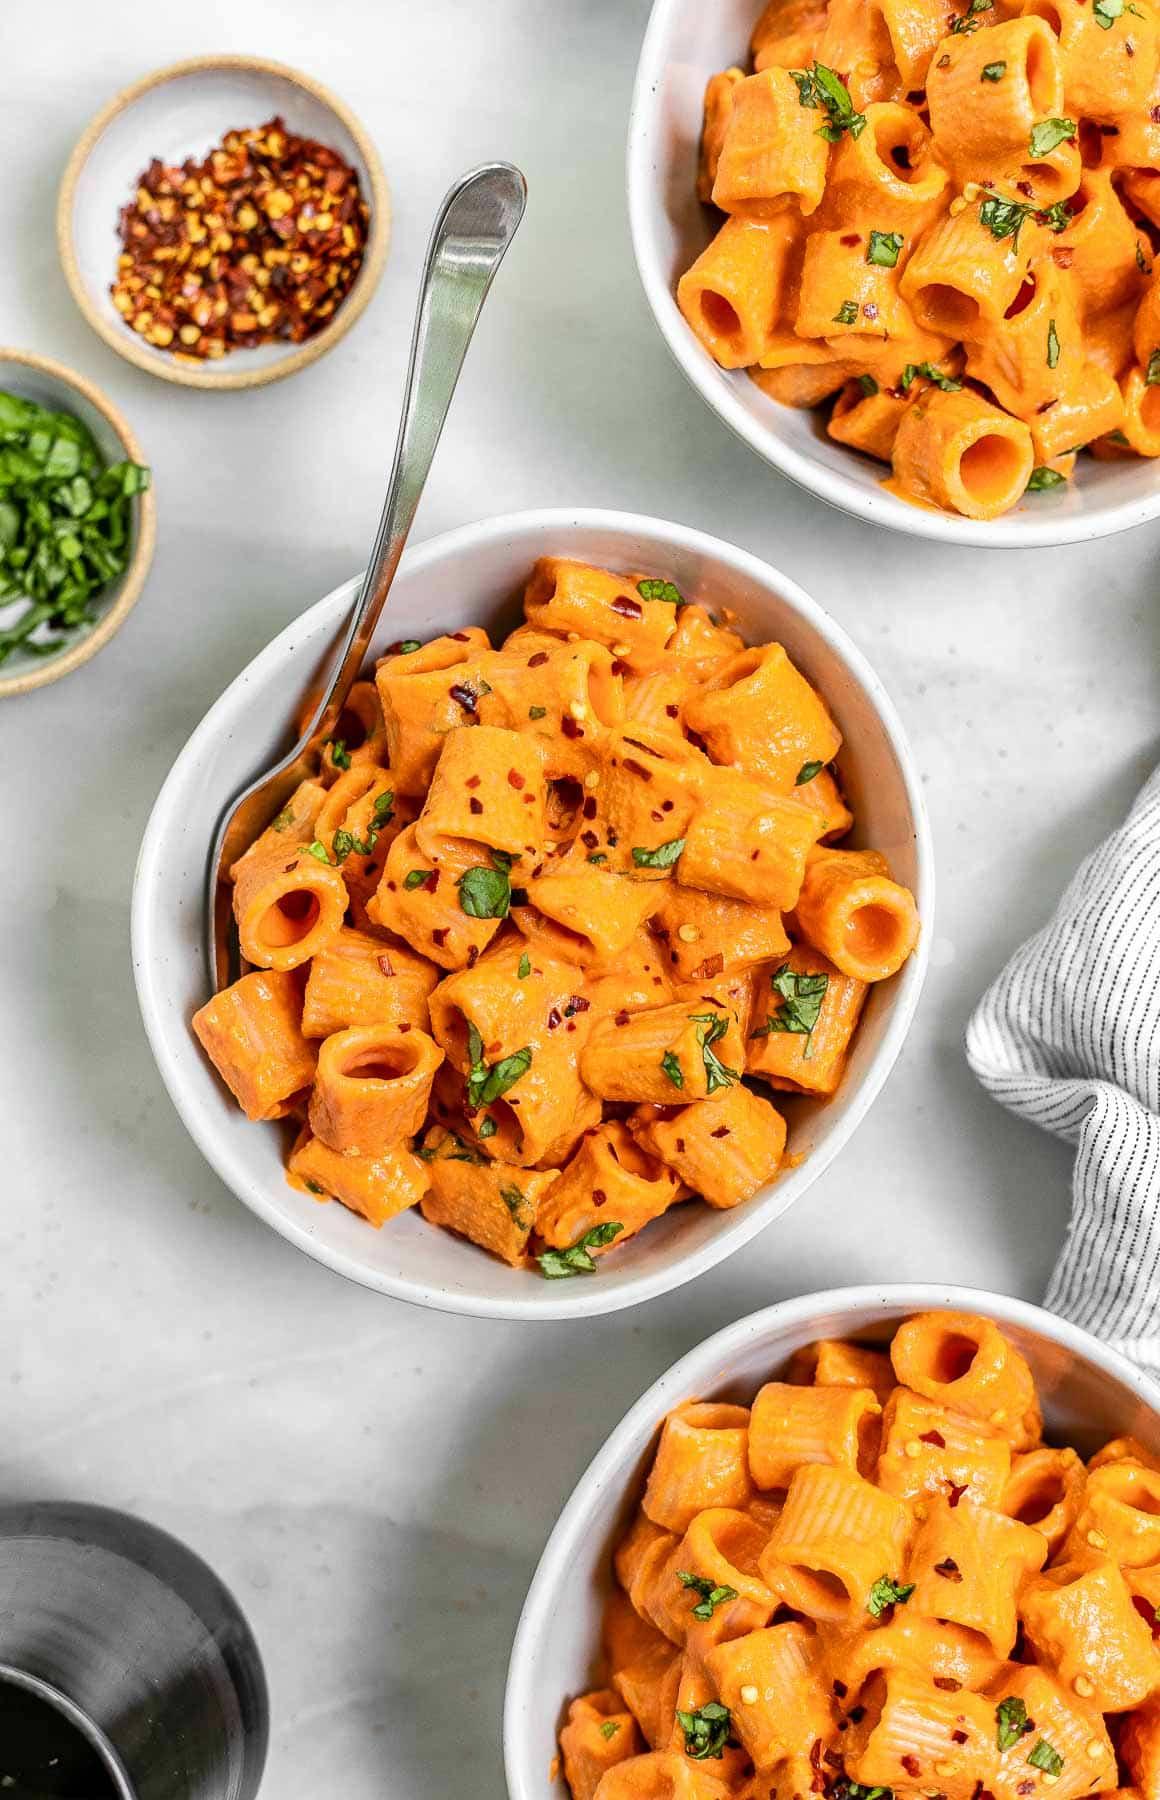 Three bowls of vegan vodka pasta with fresh basil on top.